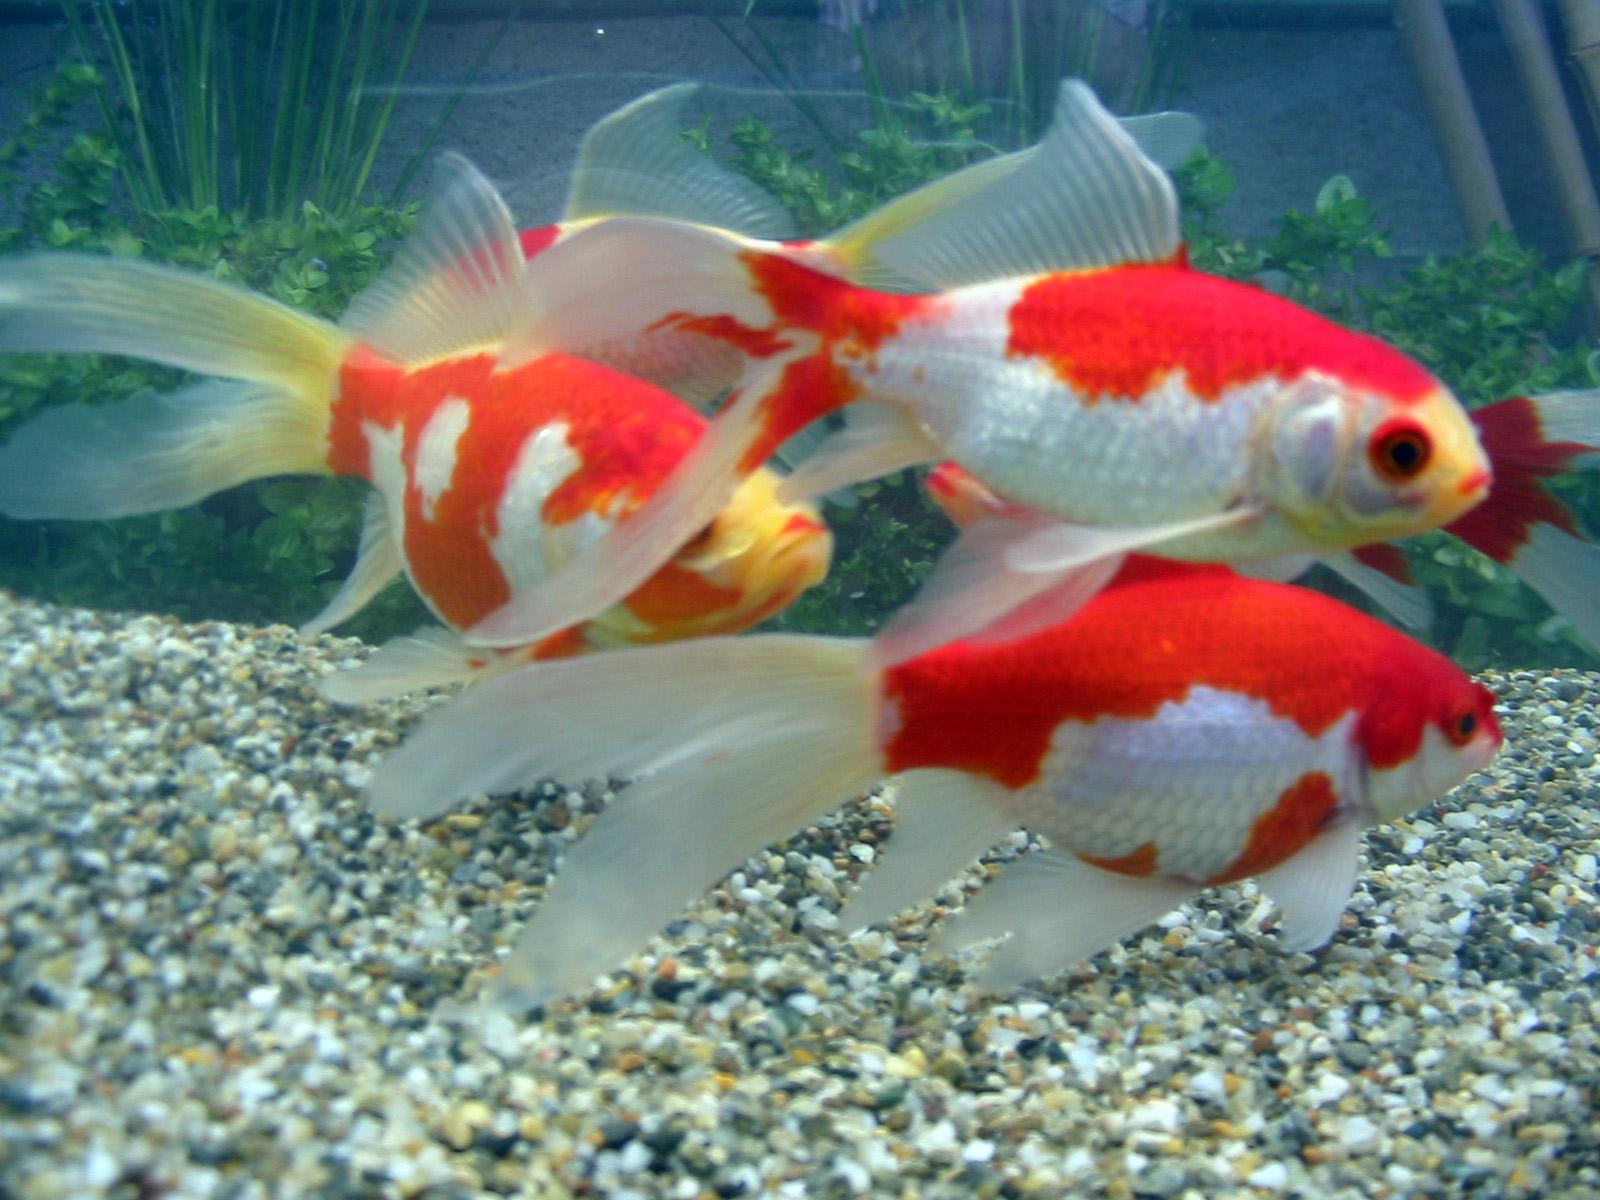 Pesci rossi variet for Dove comprare pesci rossi